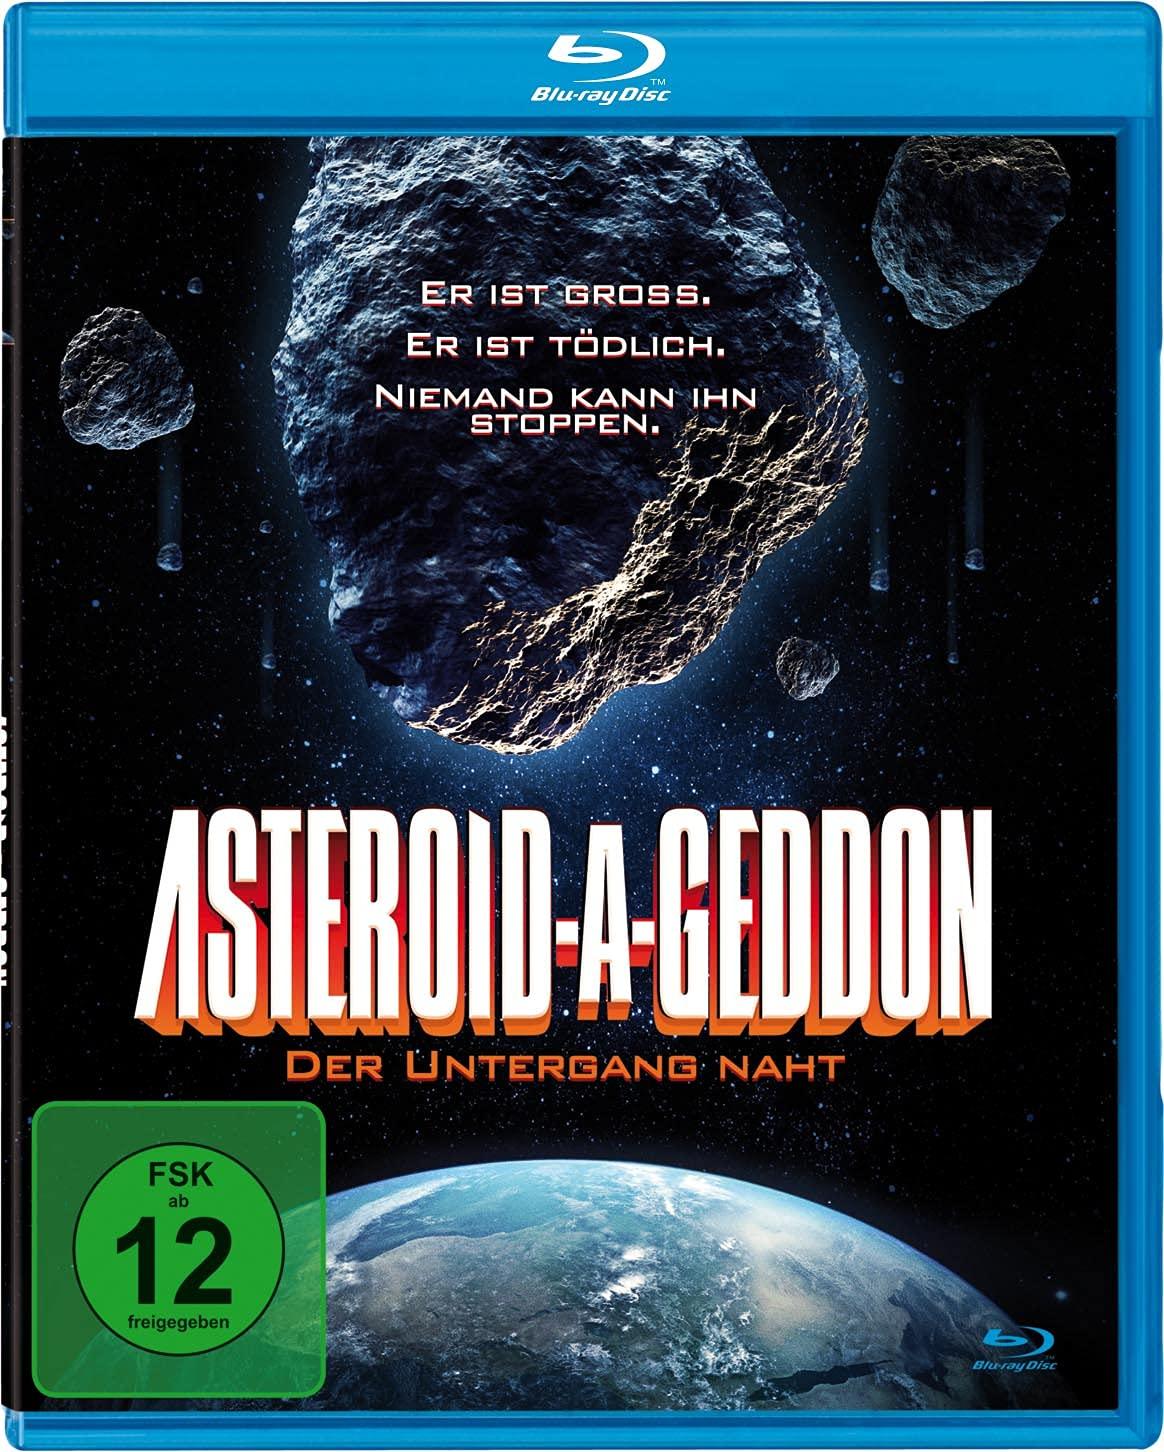 Asteroid.a.Geddon.2020.German.1080p.HDTV.x264-NORETAiL